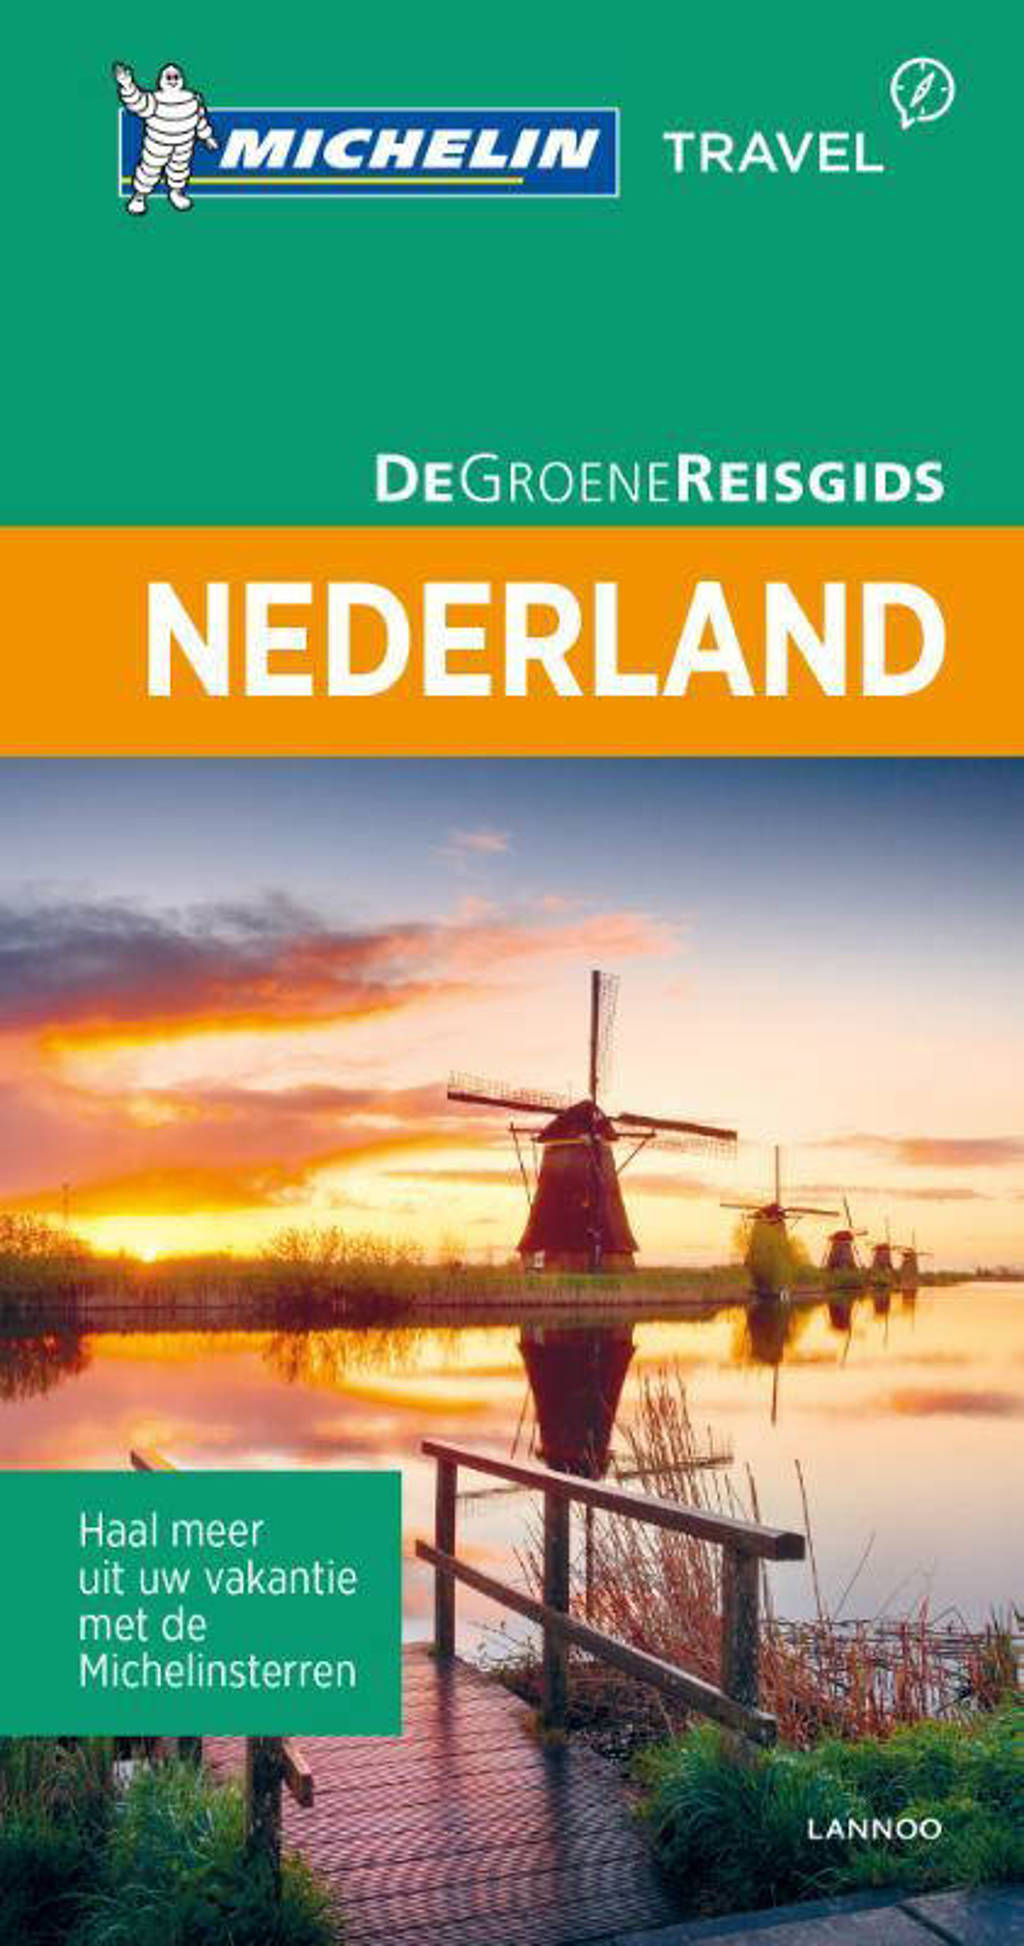 De Groene Reisgids: Nederland - Michelin